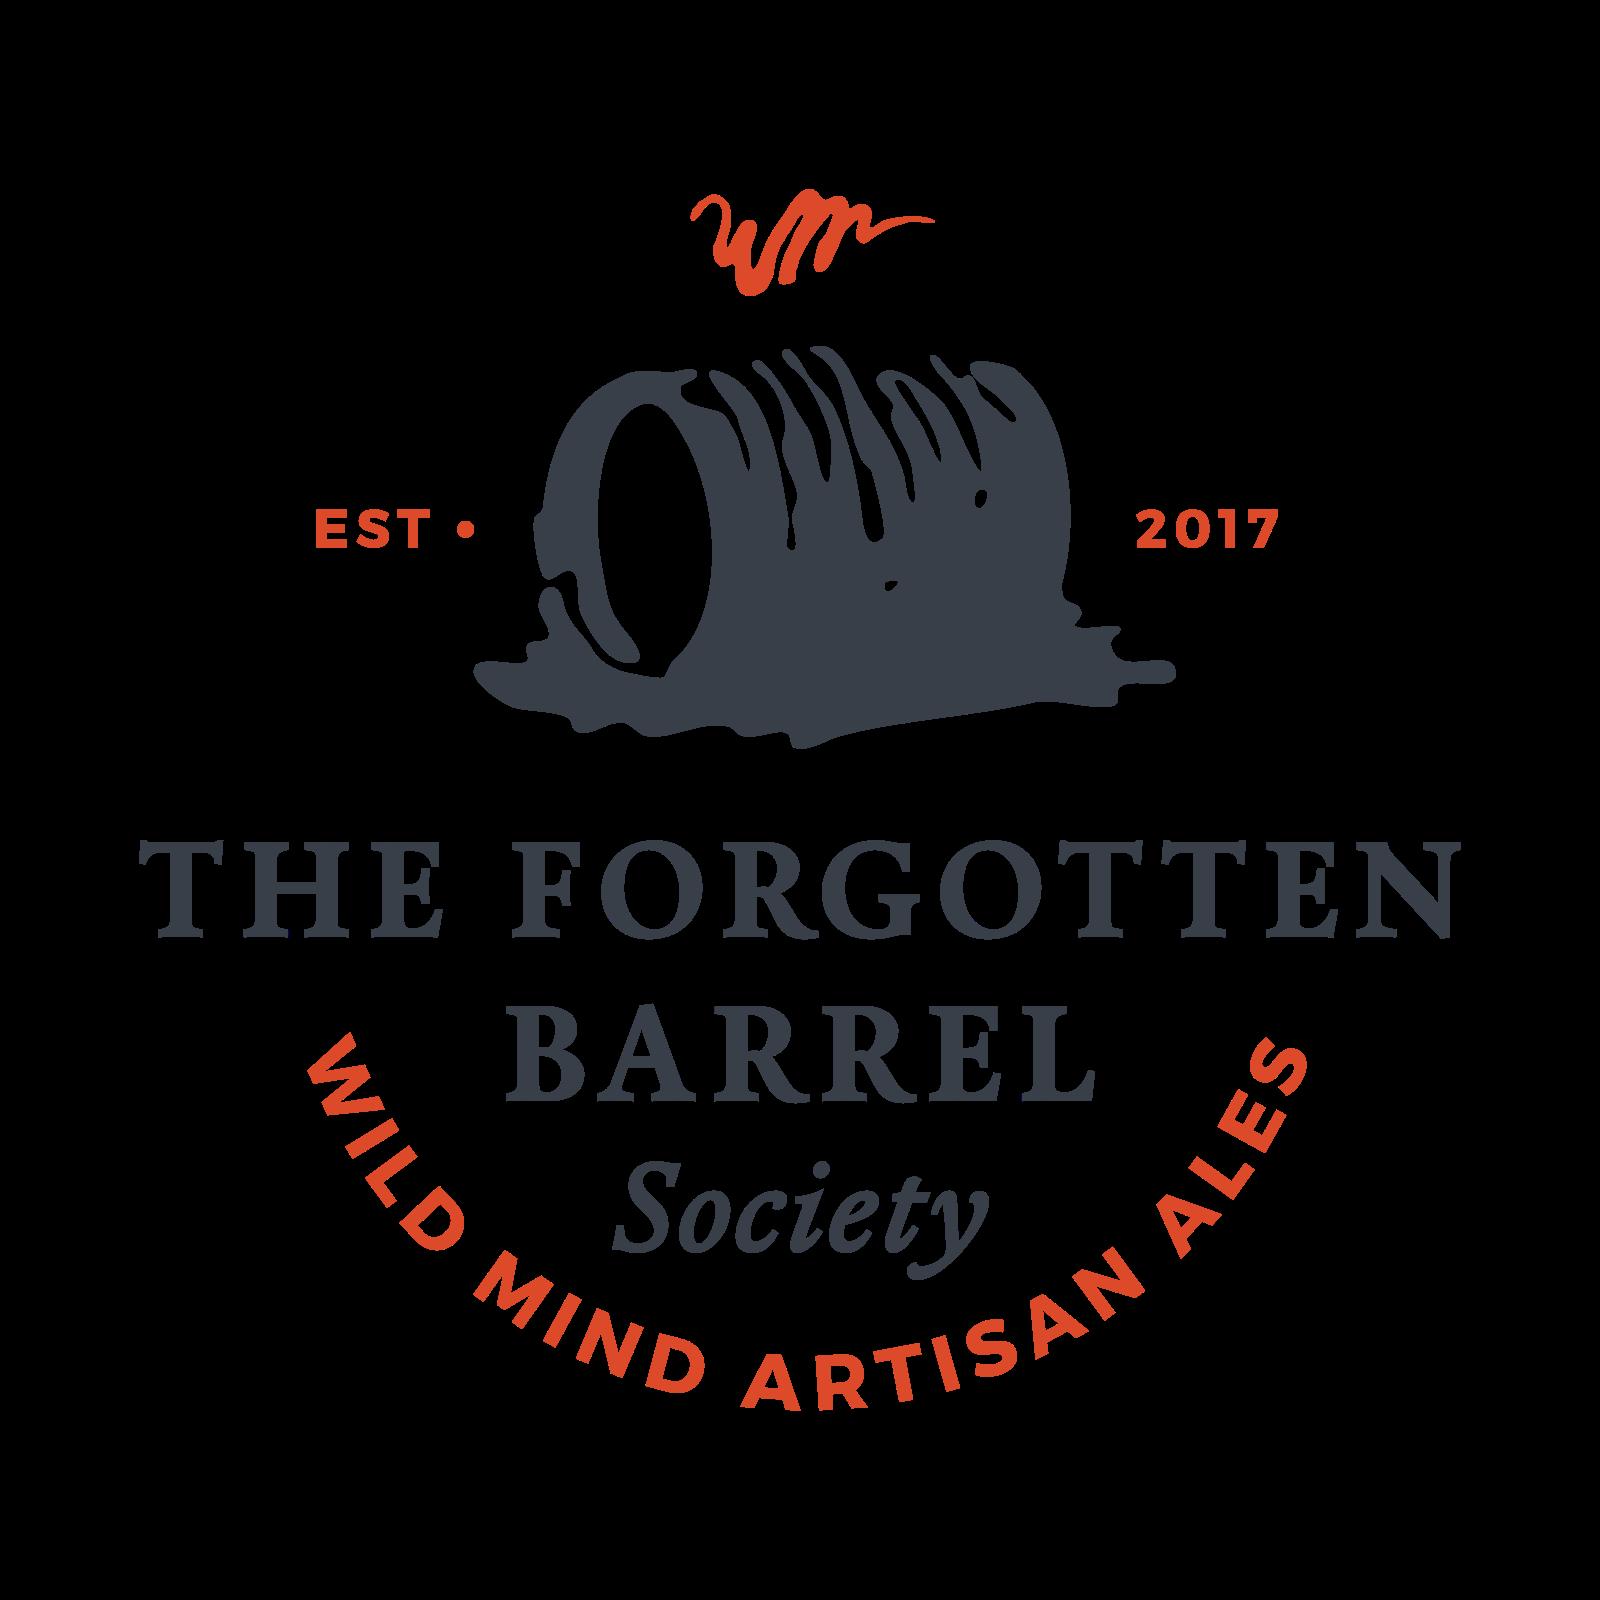 The Forgotten Barrel Society